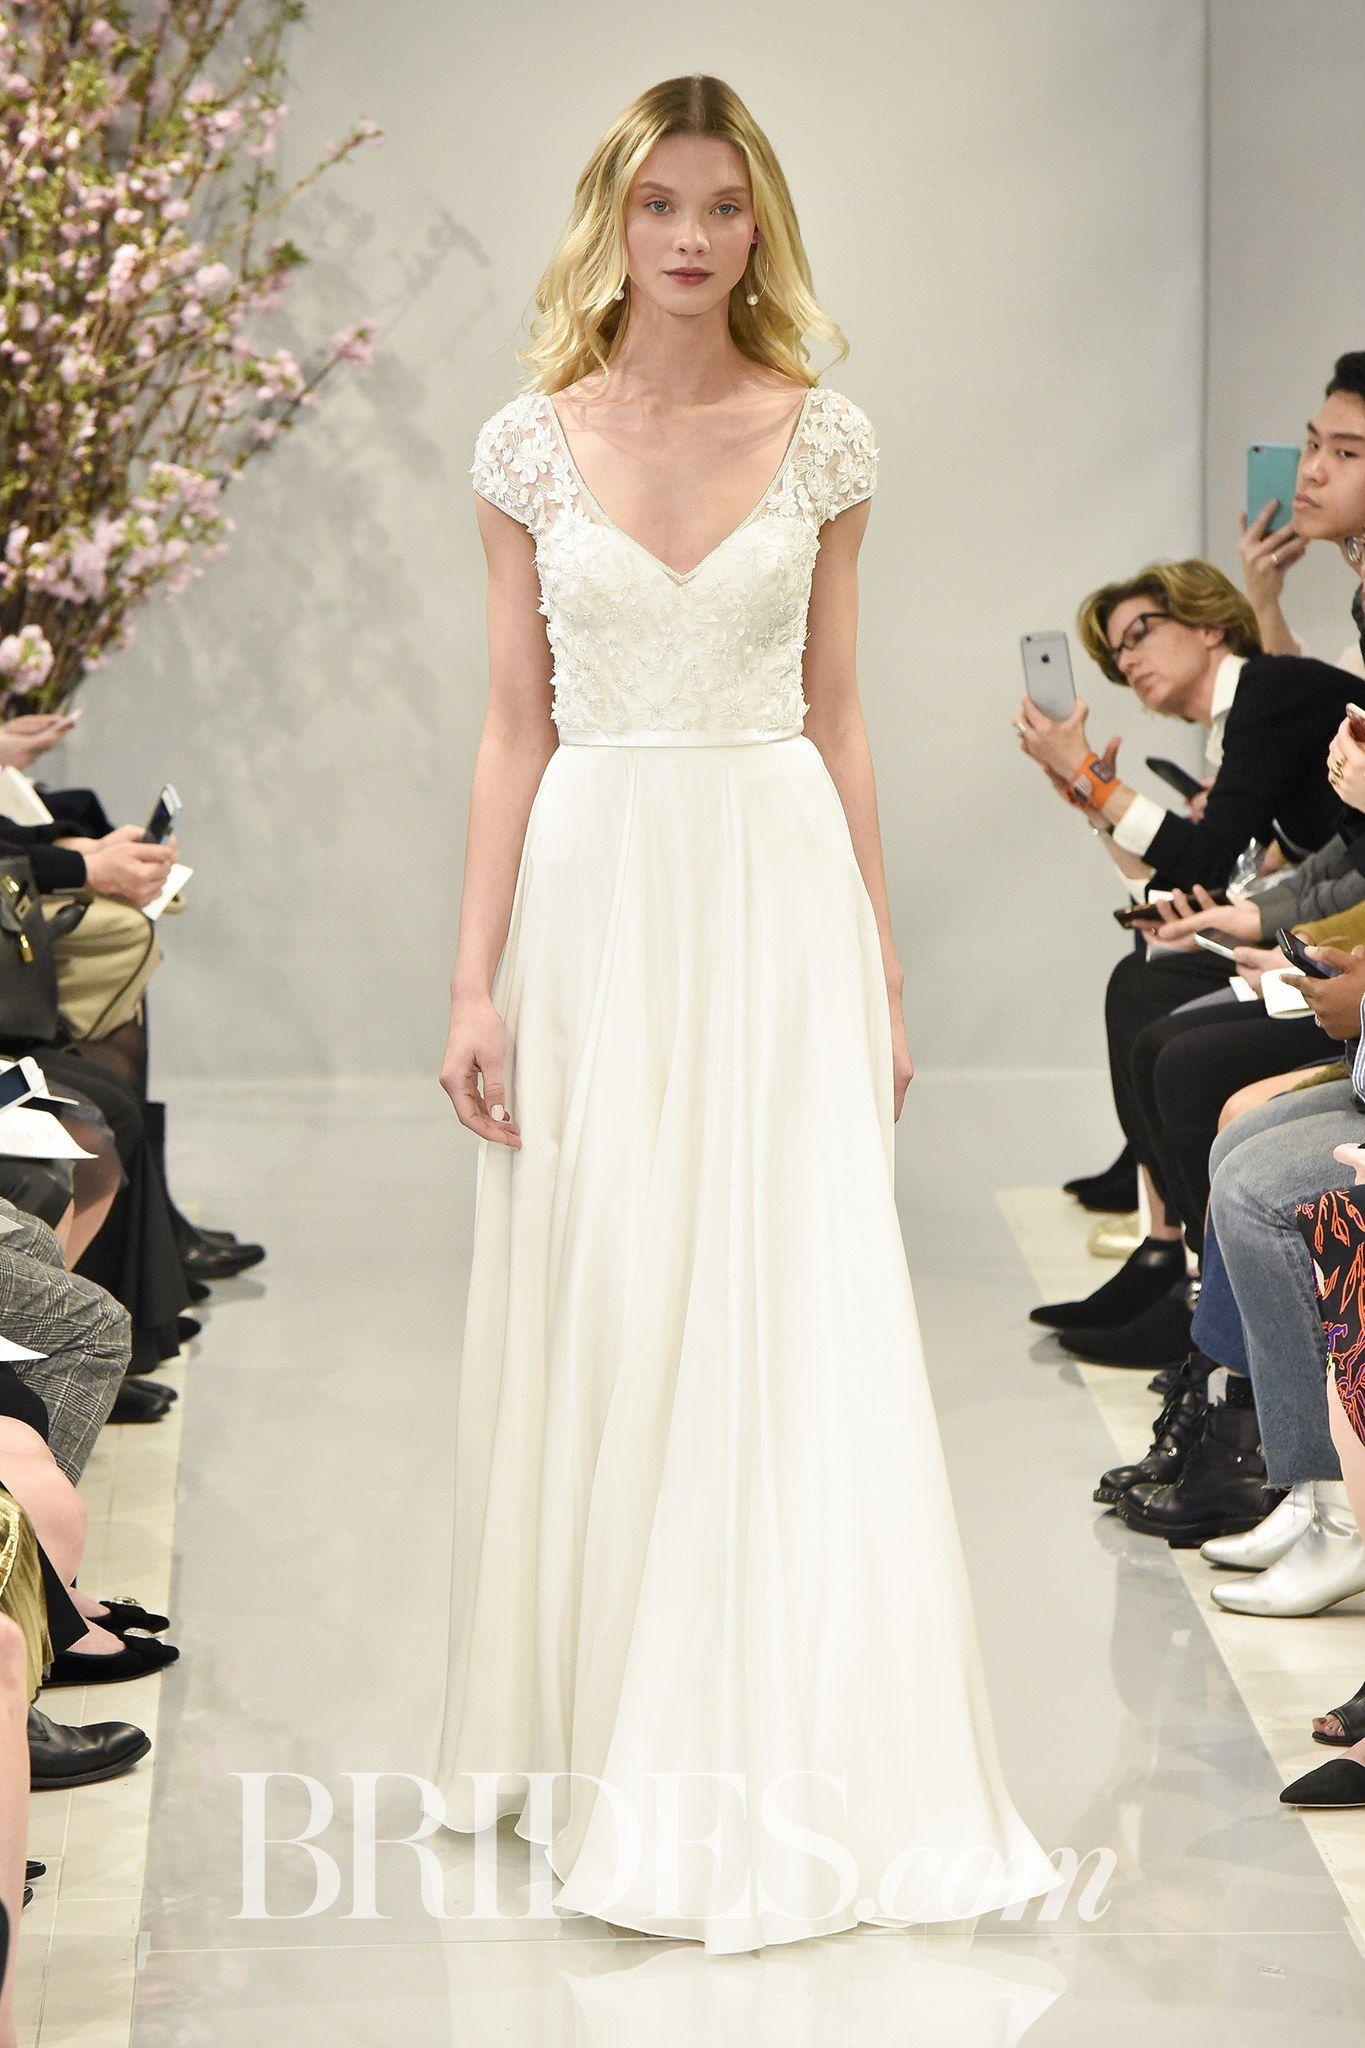 Khloe kardashian wedding dress  In a pearl white shade Theiaus